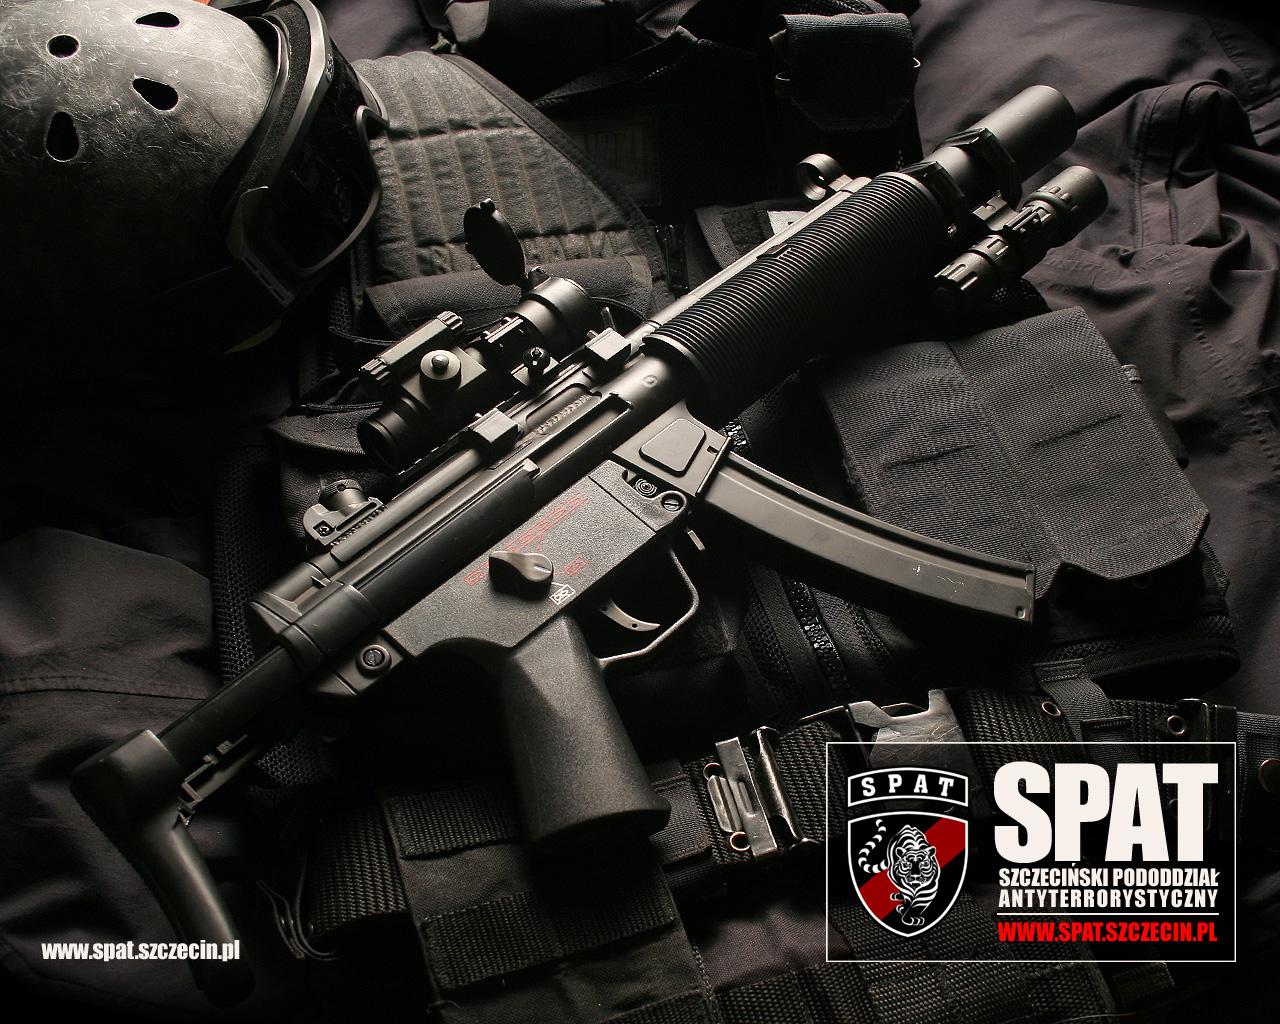 пистолет пулемет МП5, MP5 wallpaper weapons SPAT, SWAT, обои, оружие